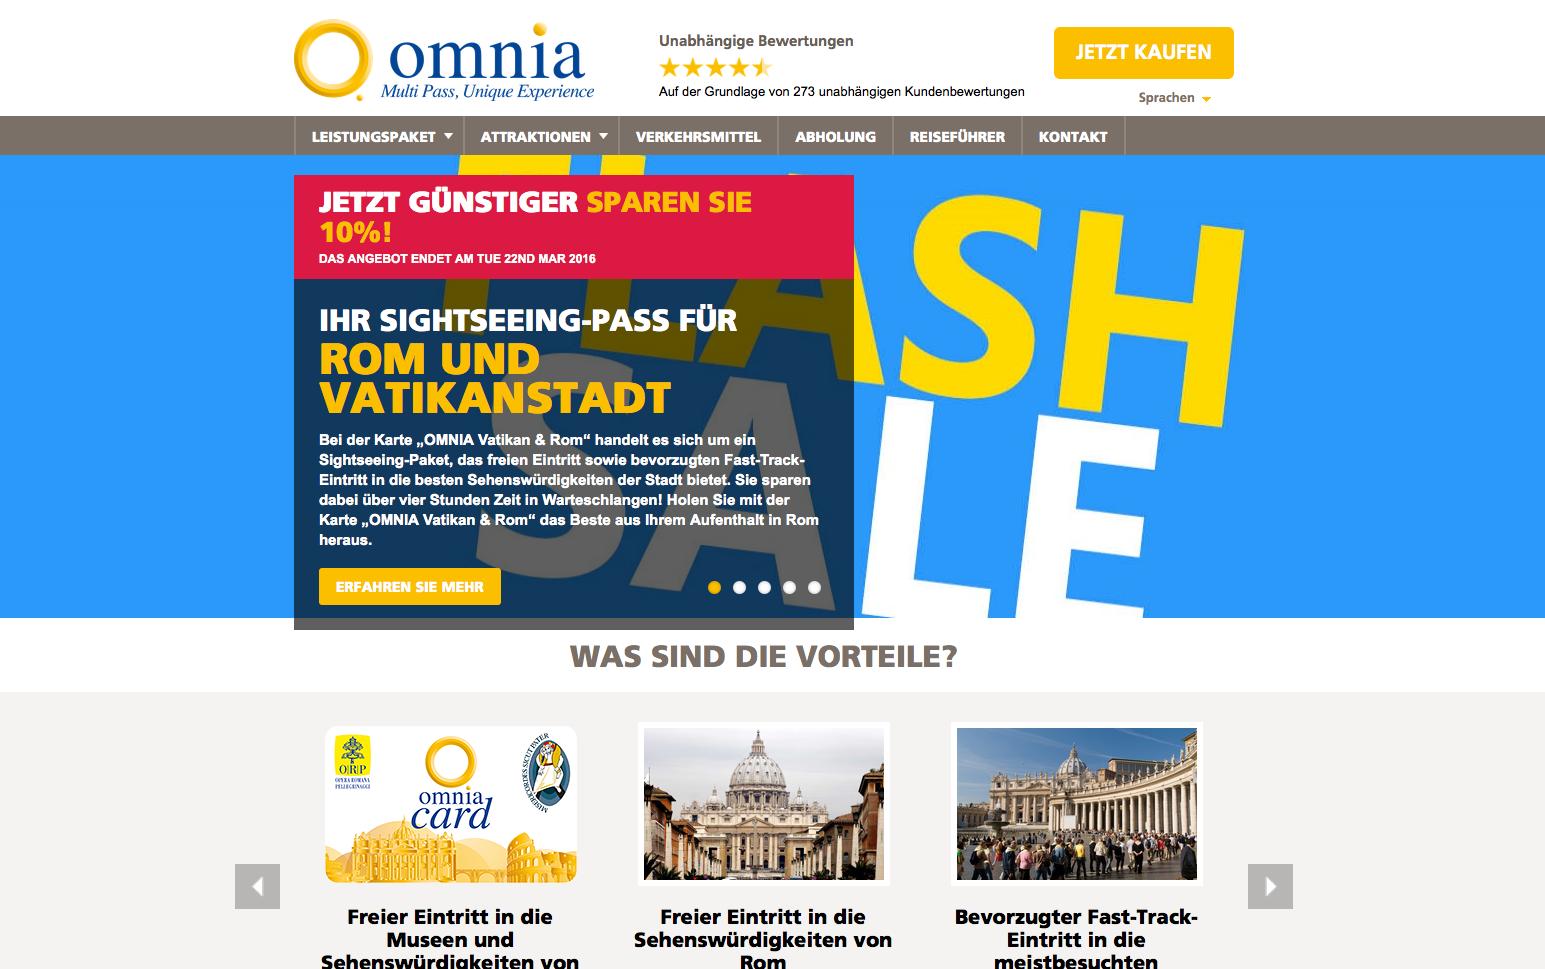 Omnia Rome & Vatican Pass Gutschein